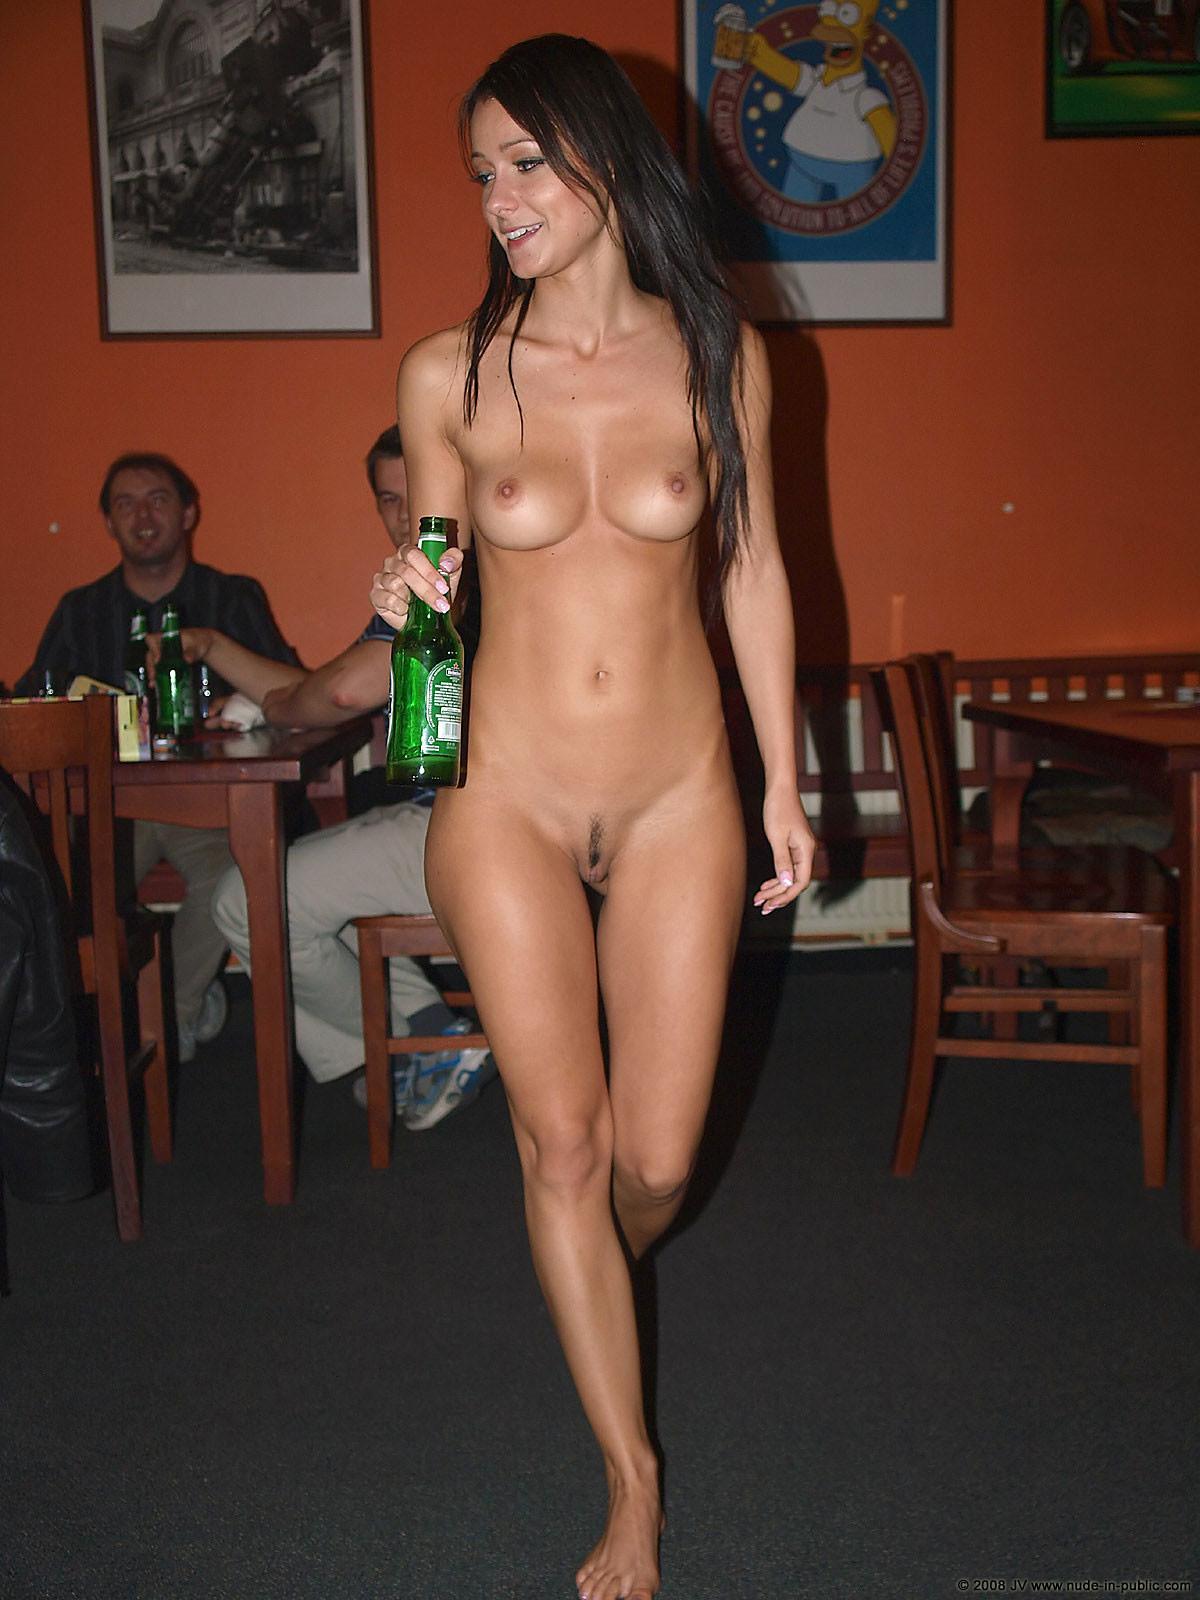 Naked waitress ass, crystal clear adult star